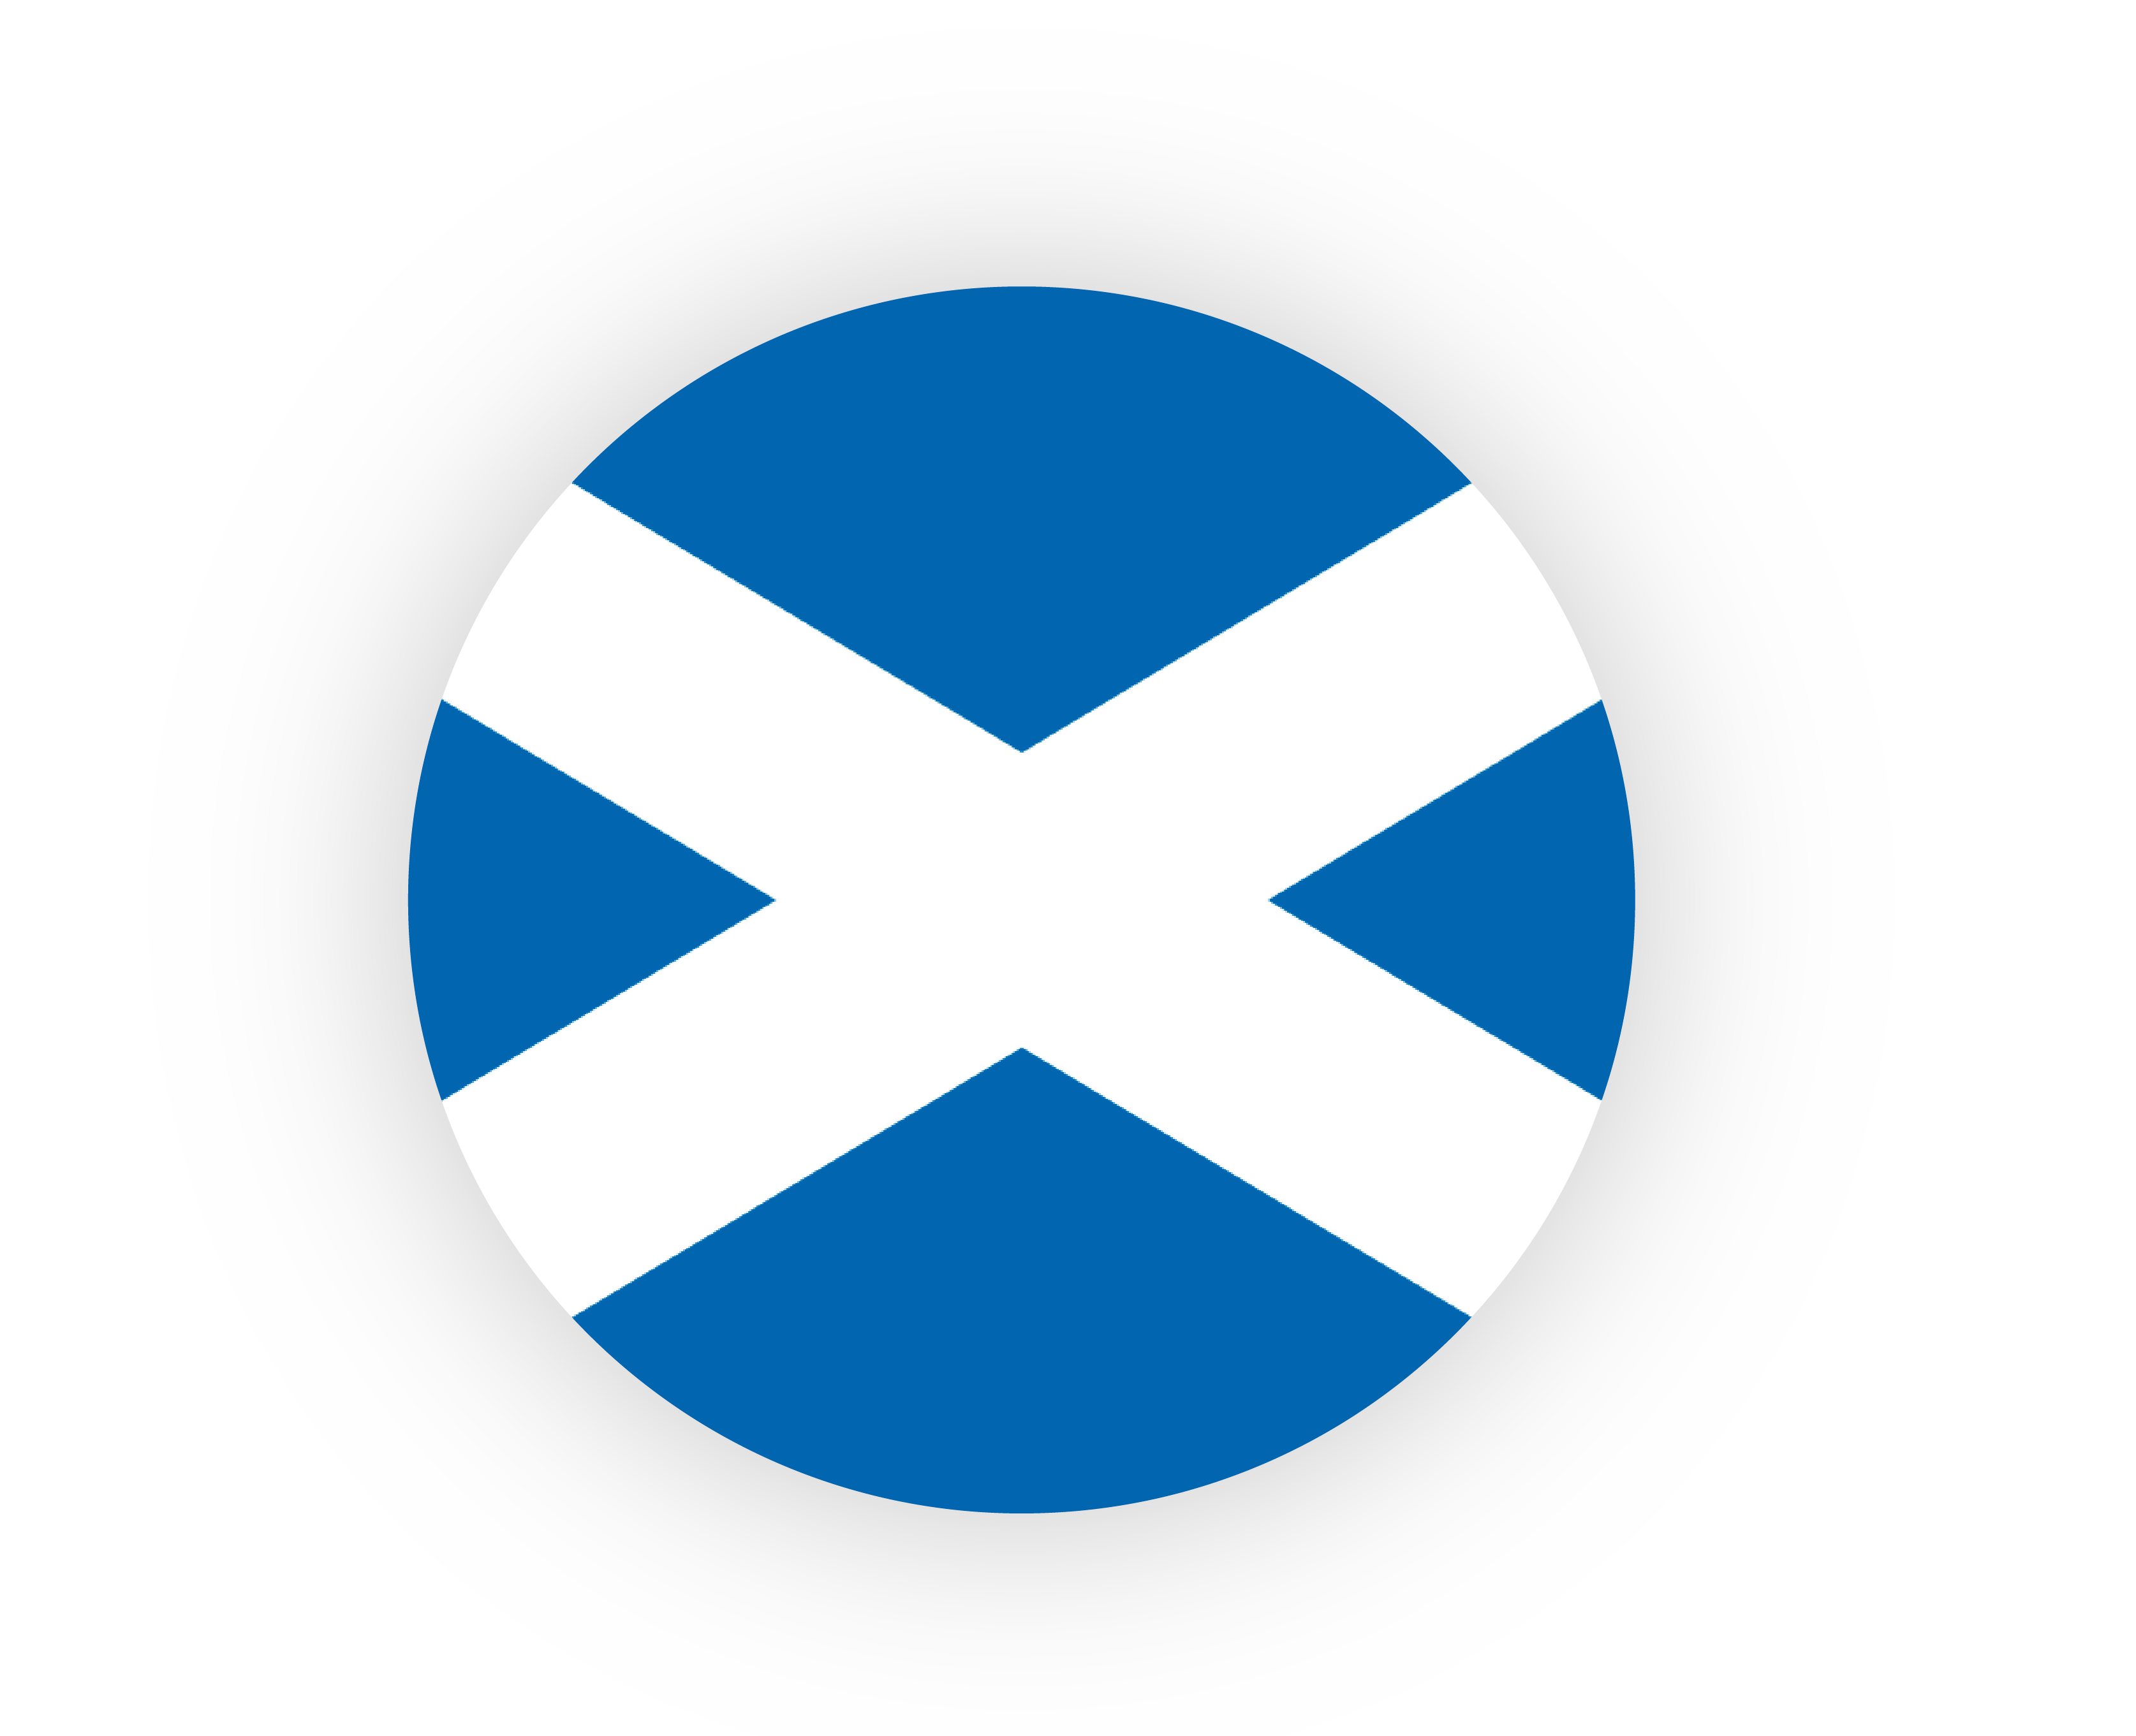 Scottish Flag in Circle